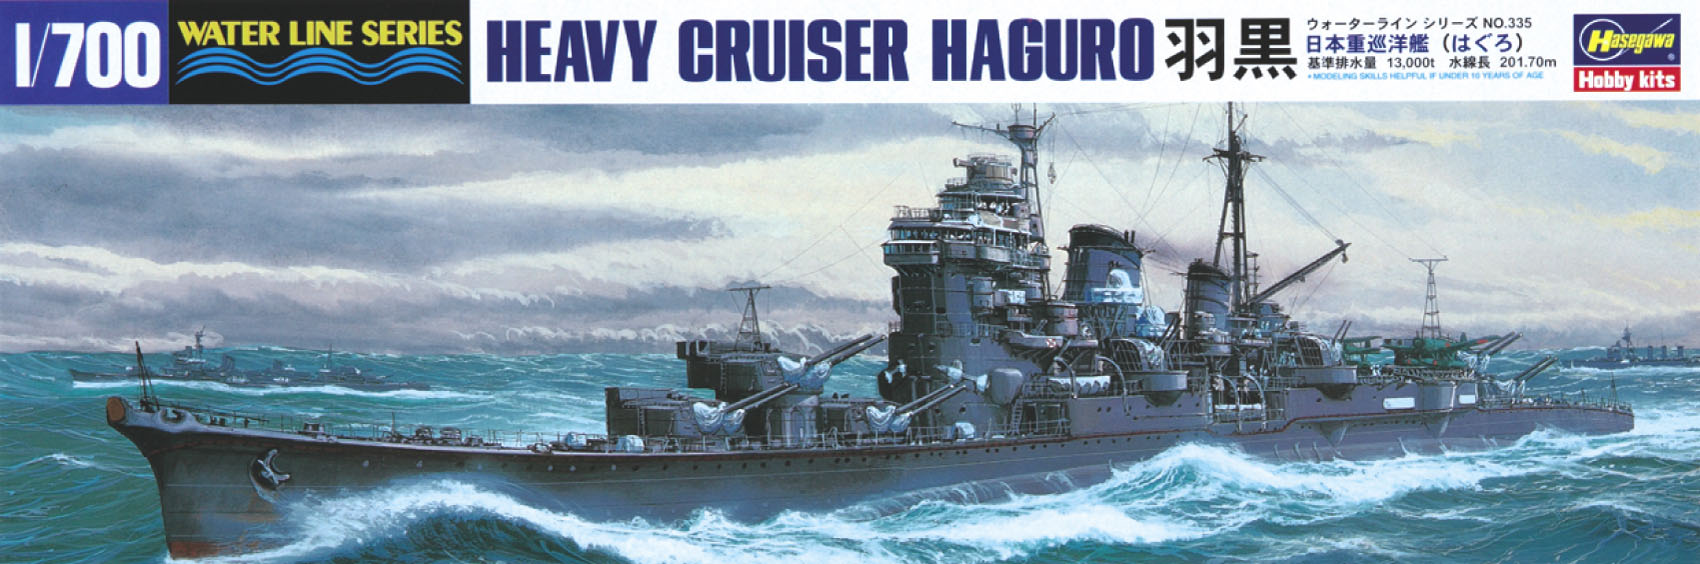 Hasegawa Ijn Heavy Cruiser Haguro